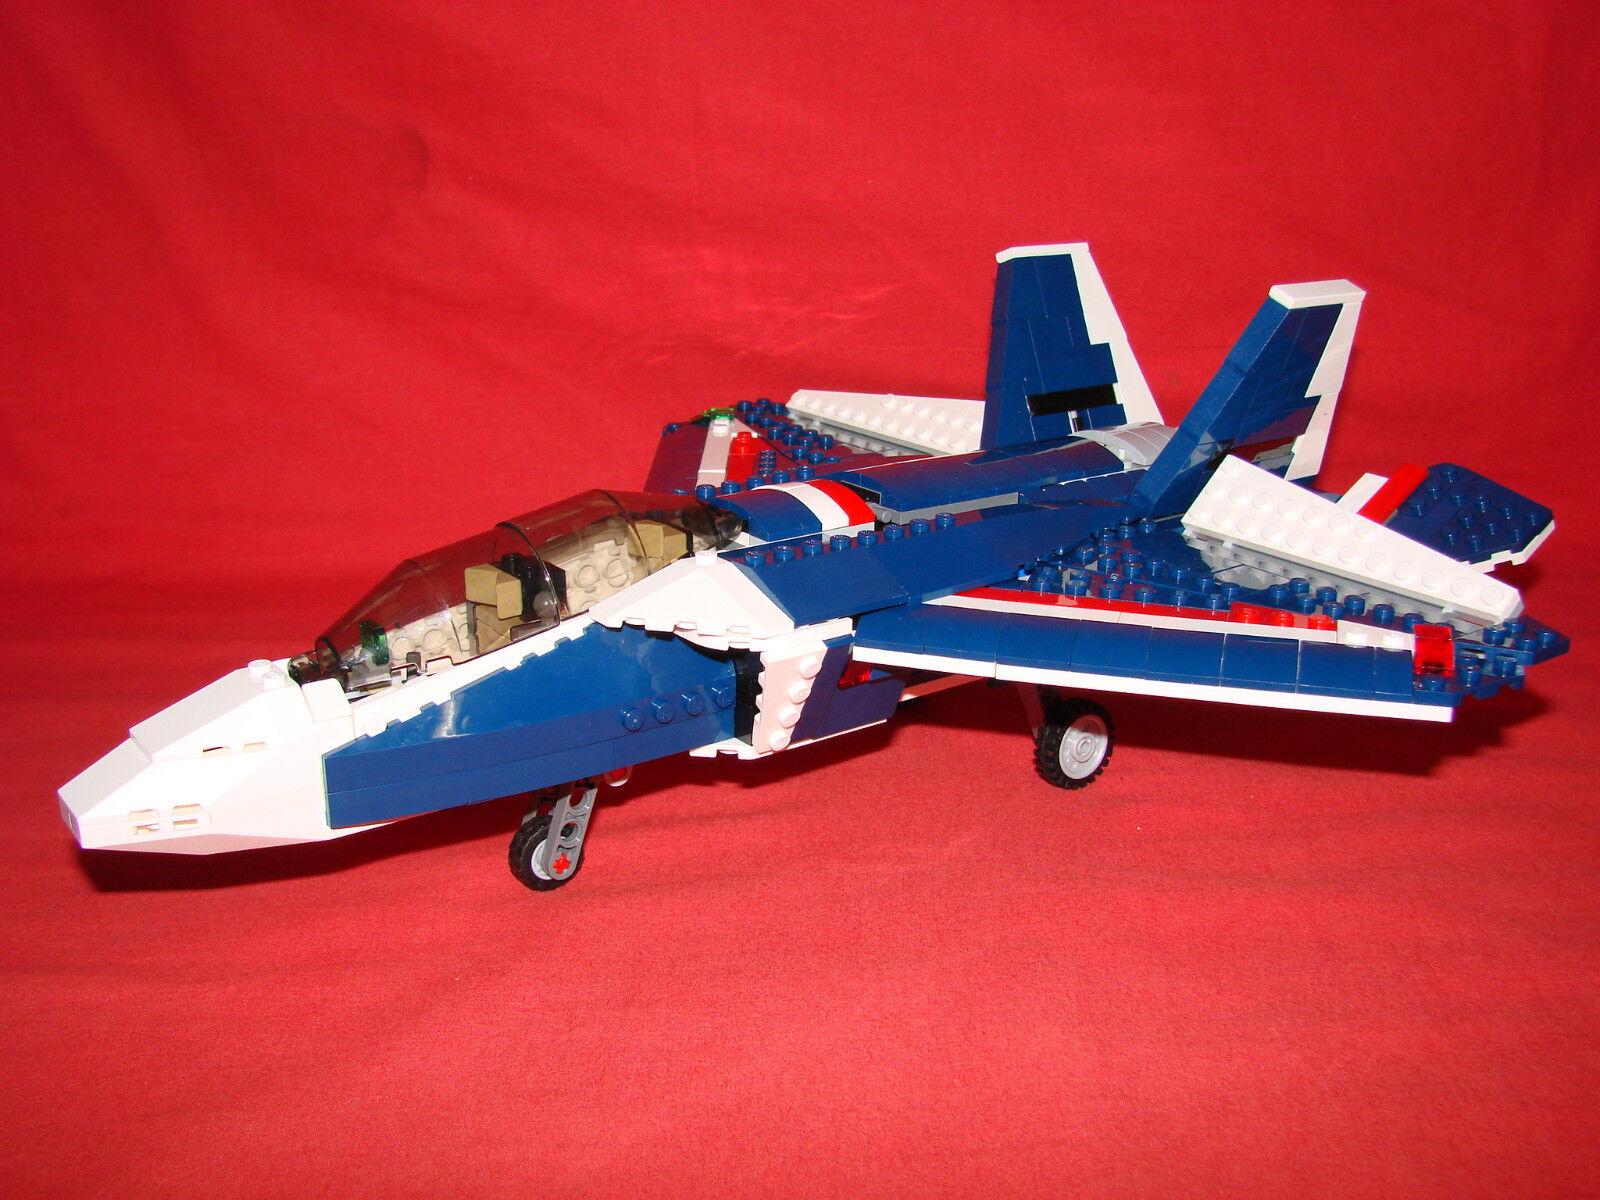 Lego Creator ref 31039 L'avion bleu - Jouet - Toy